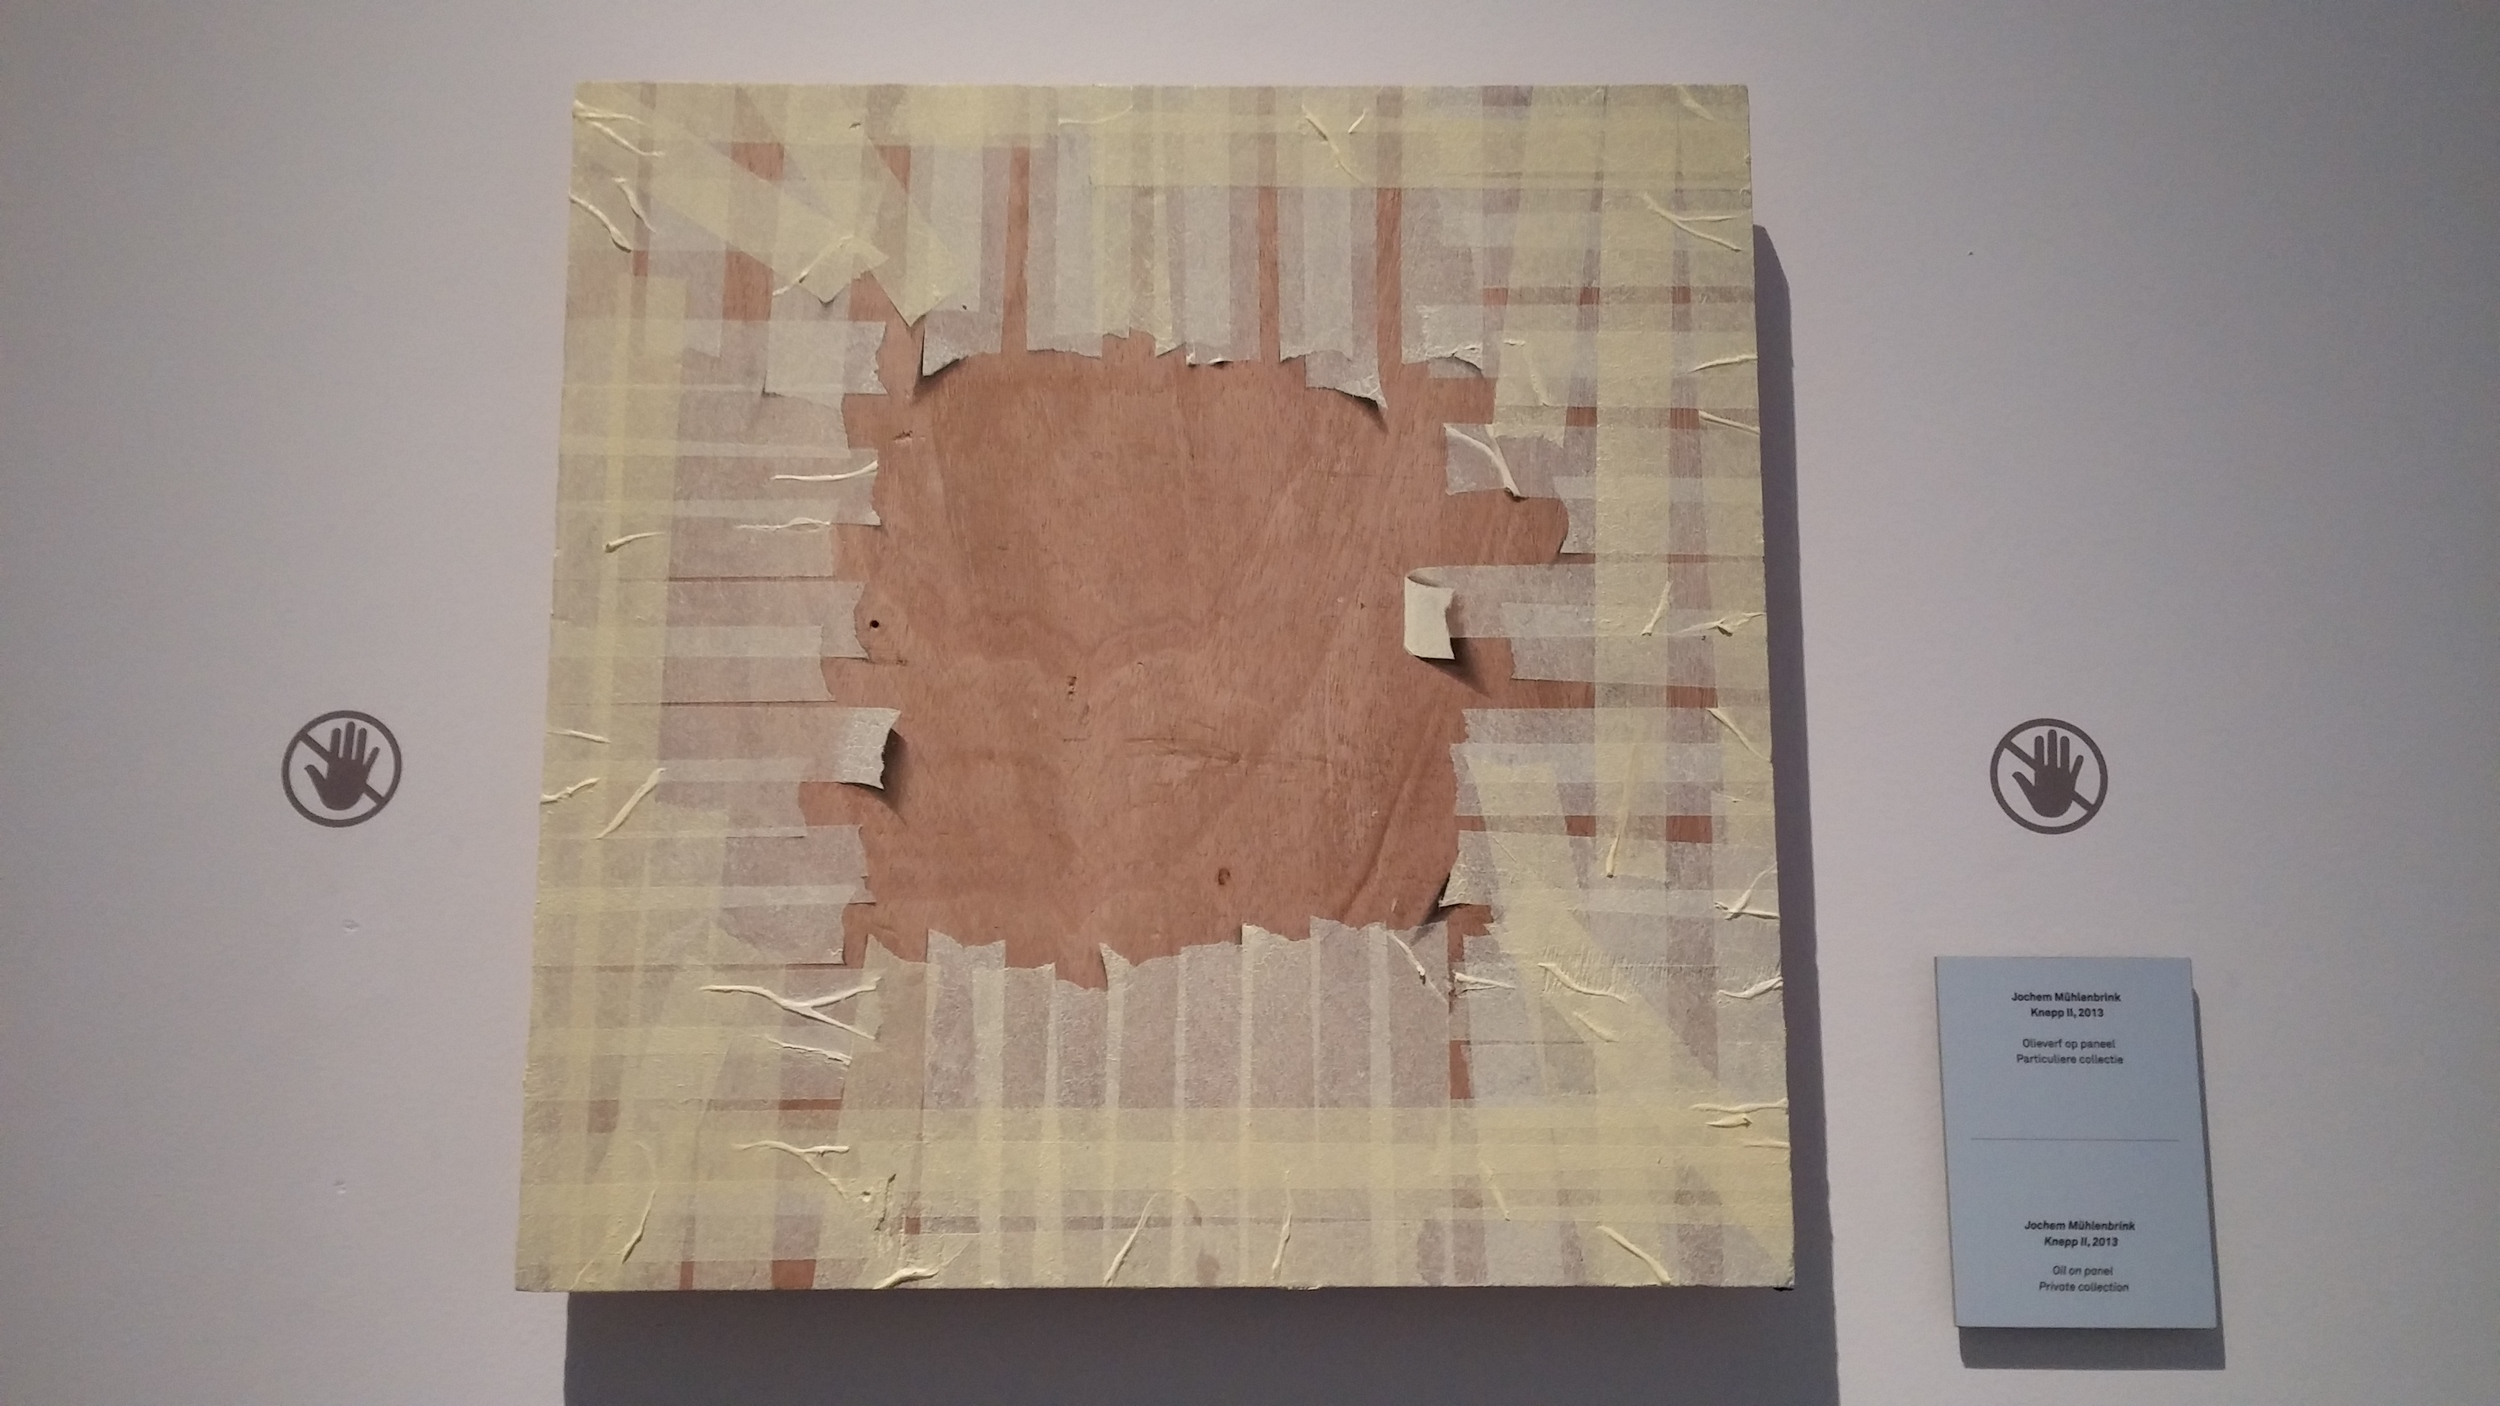 Oil on wood panel. No tape.